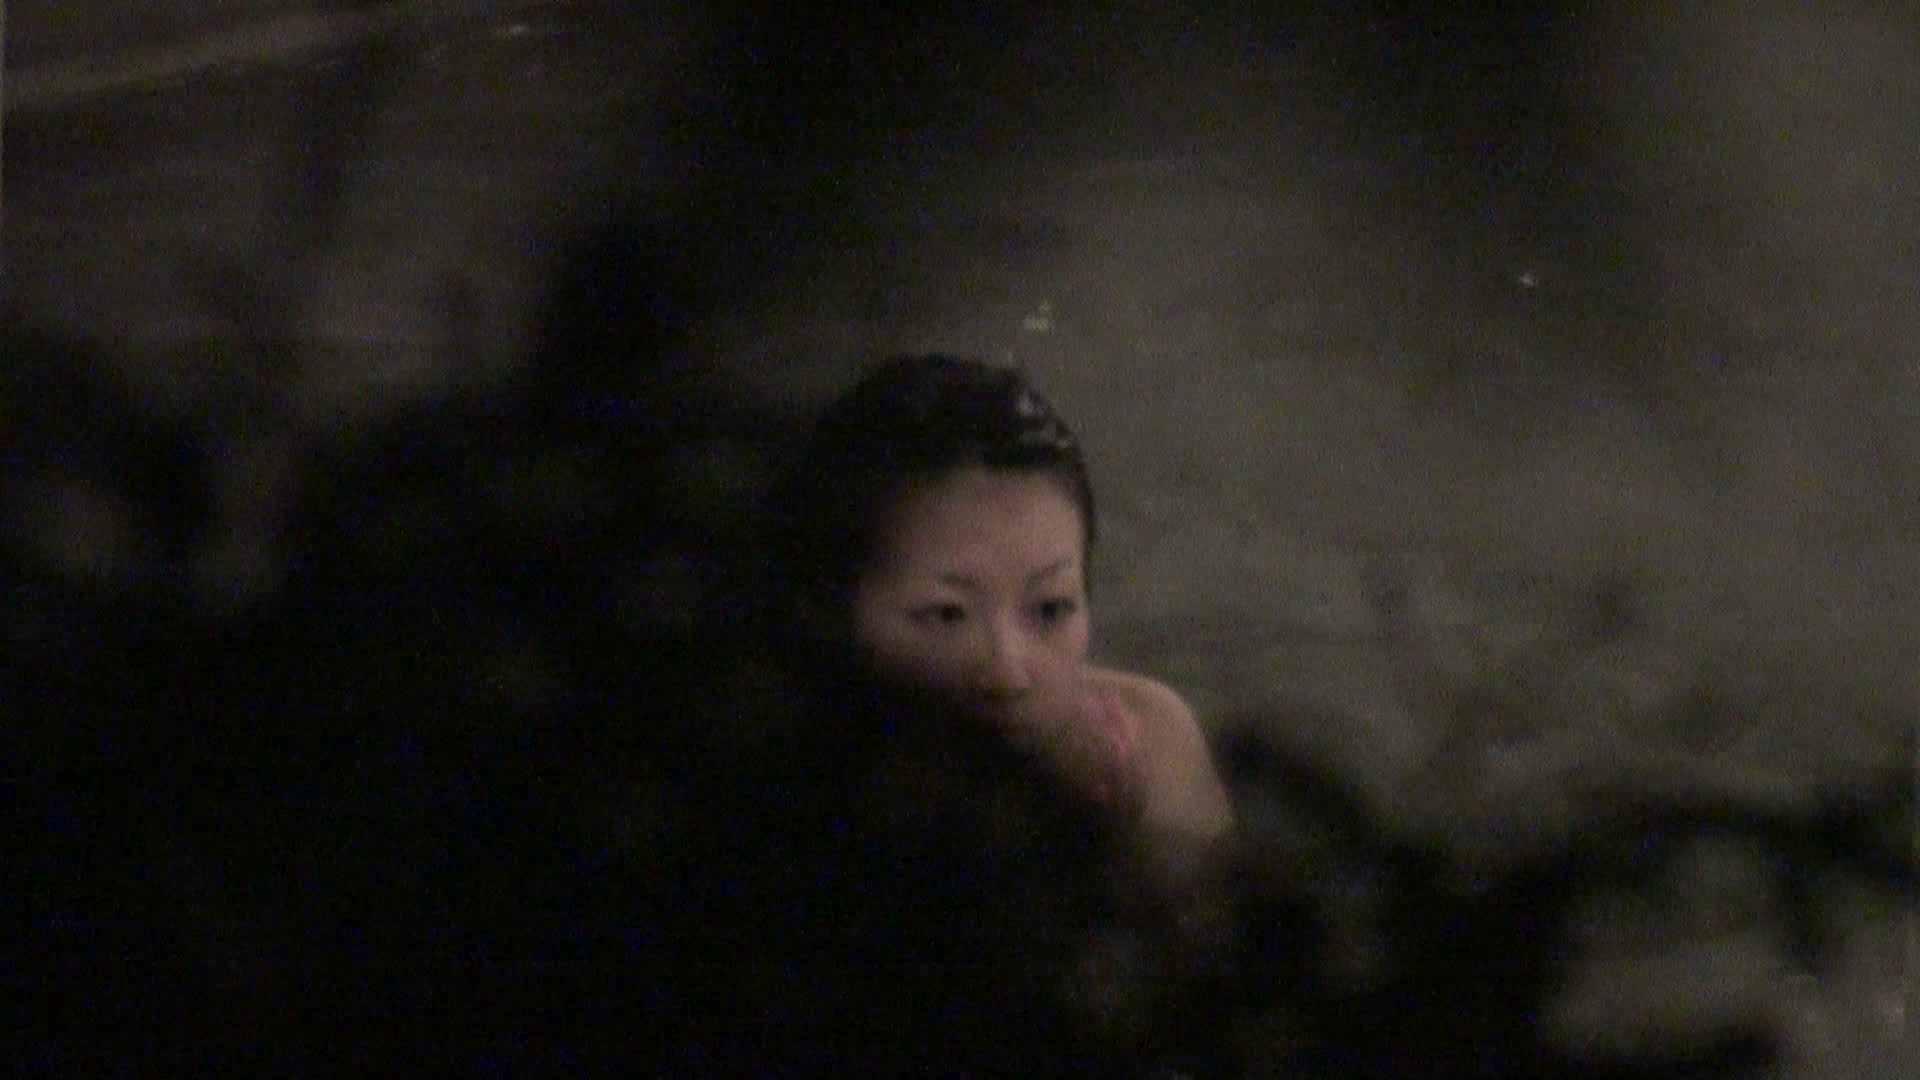 Aquaな露天風呂Vol.375 OLエロ画像 盗撮おめこ無修正動画無料 78PICs 29